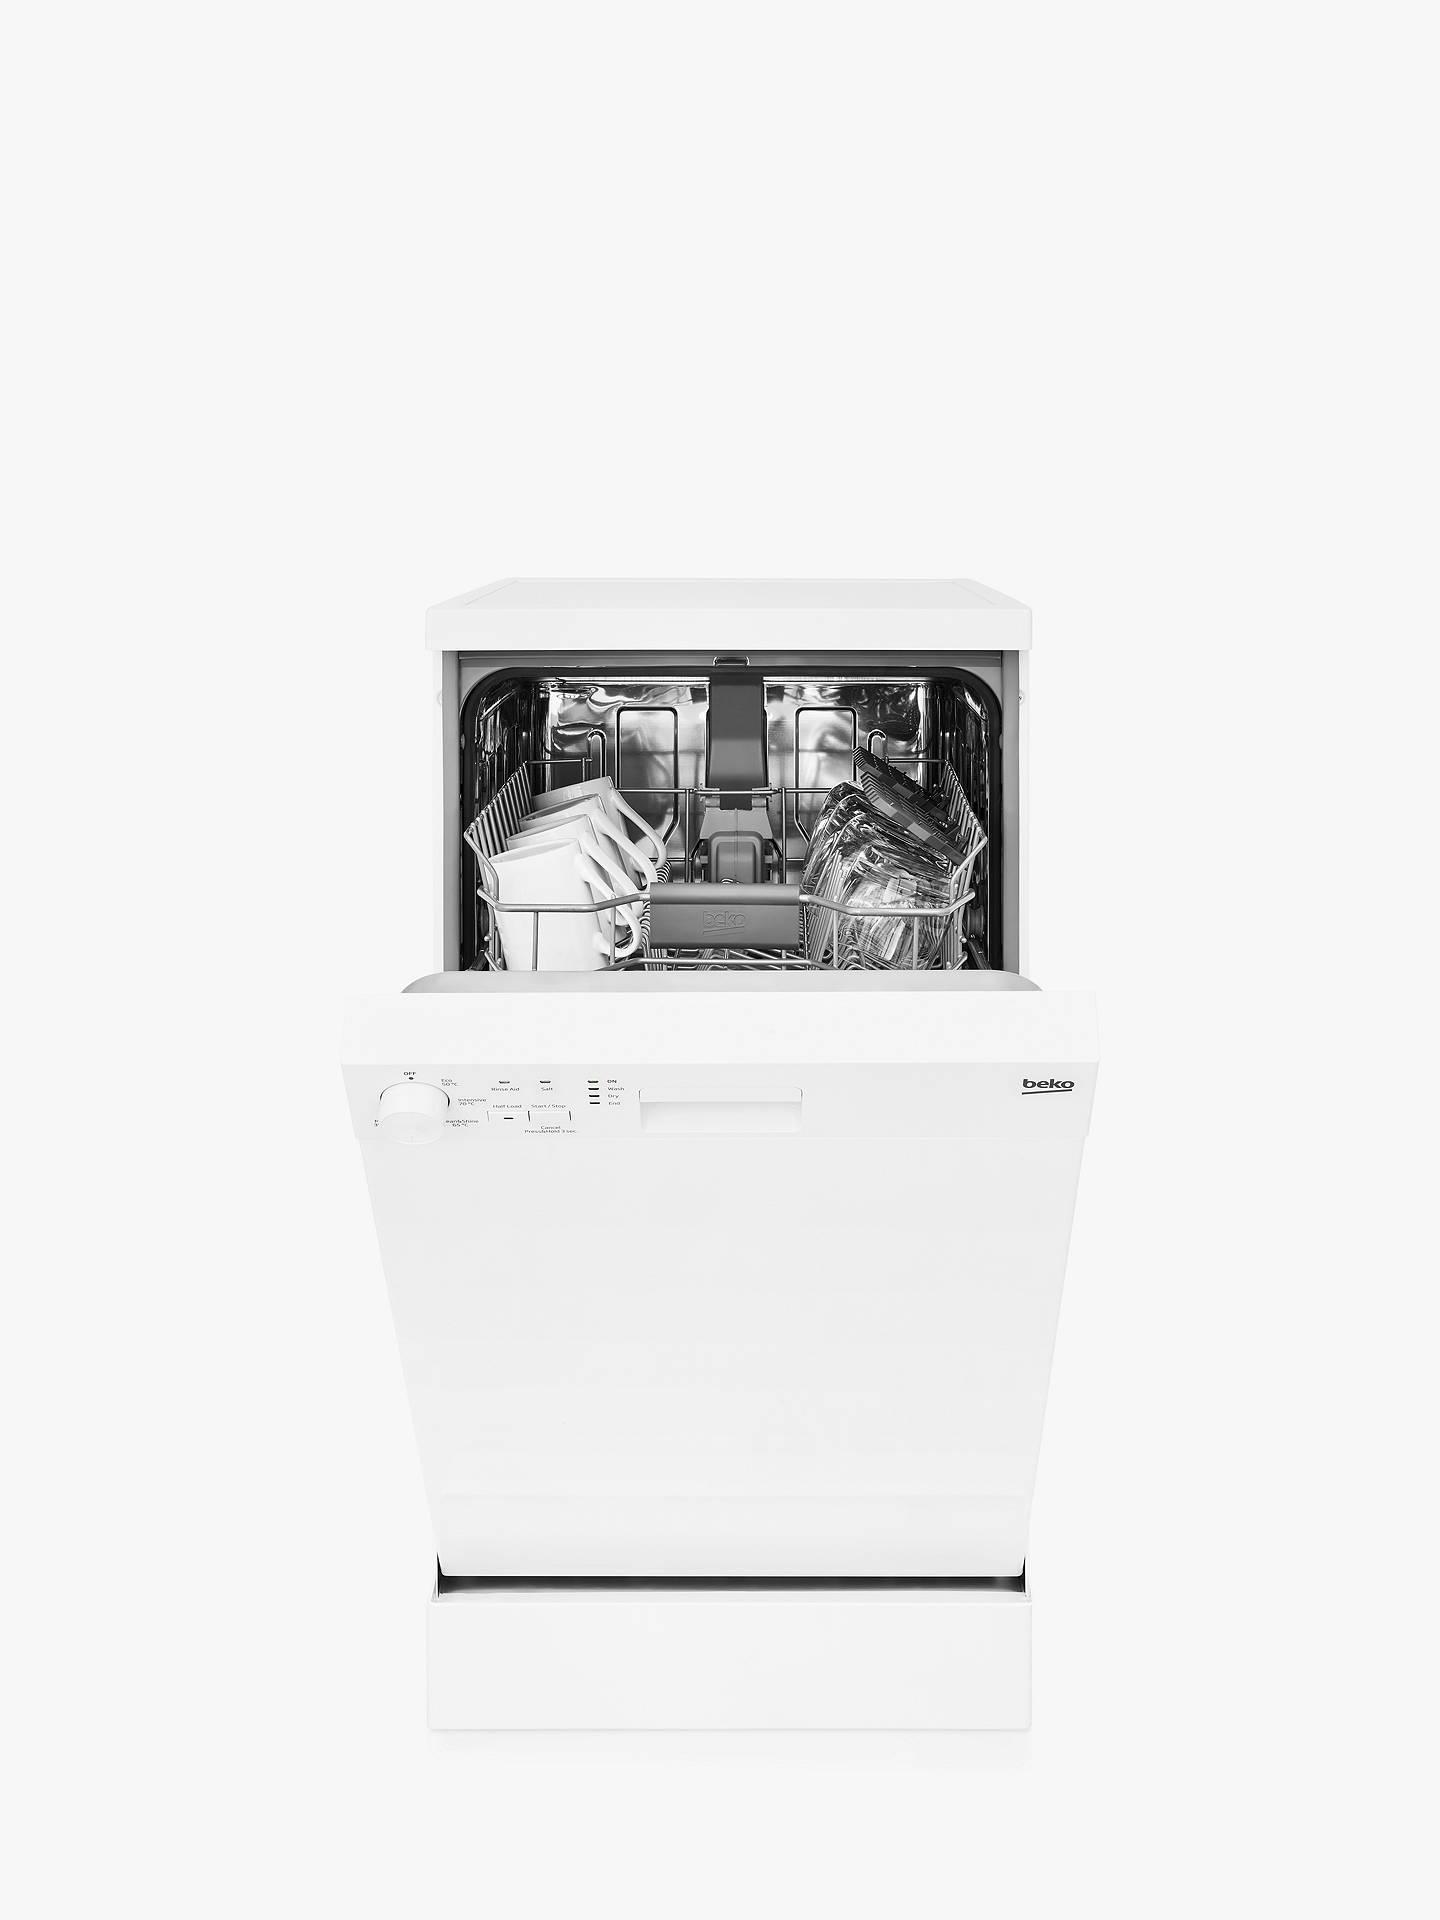 Beko DFS05J1W Freestanding Slimline Dishwasher, White at